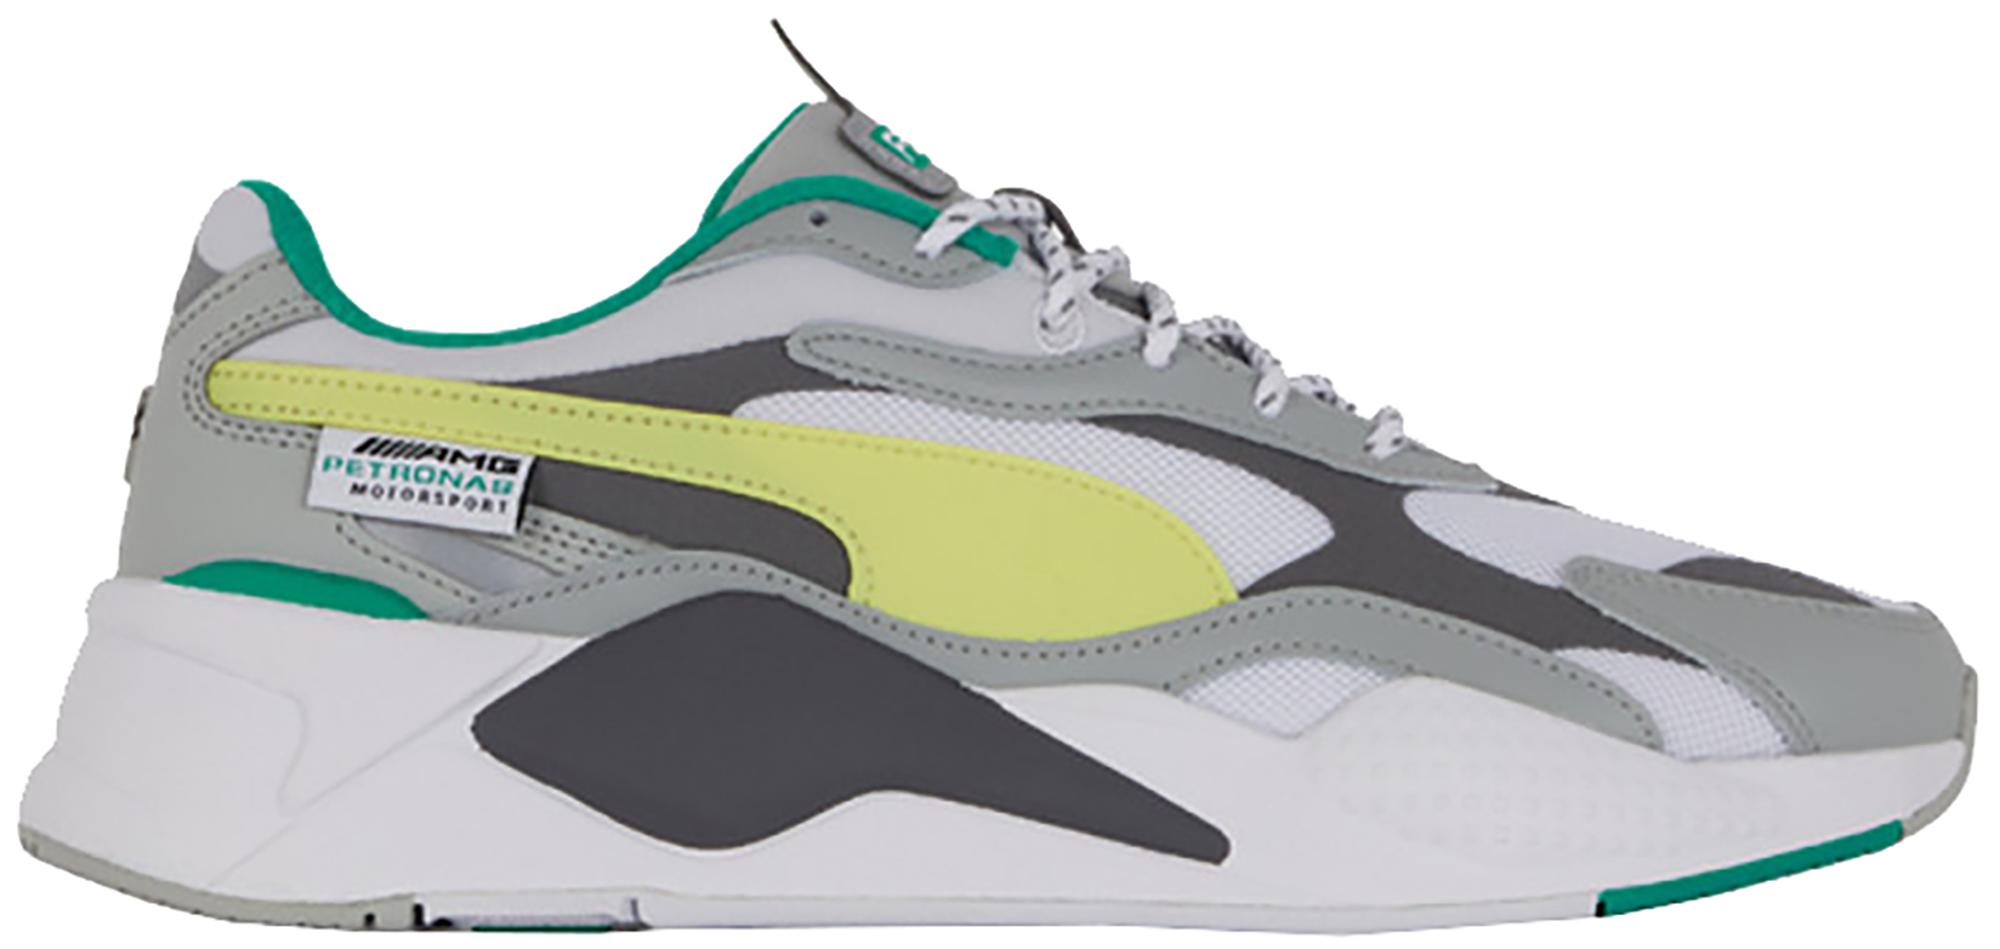 puma amg petronas sneakers